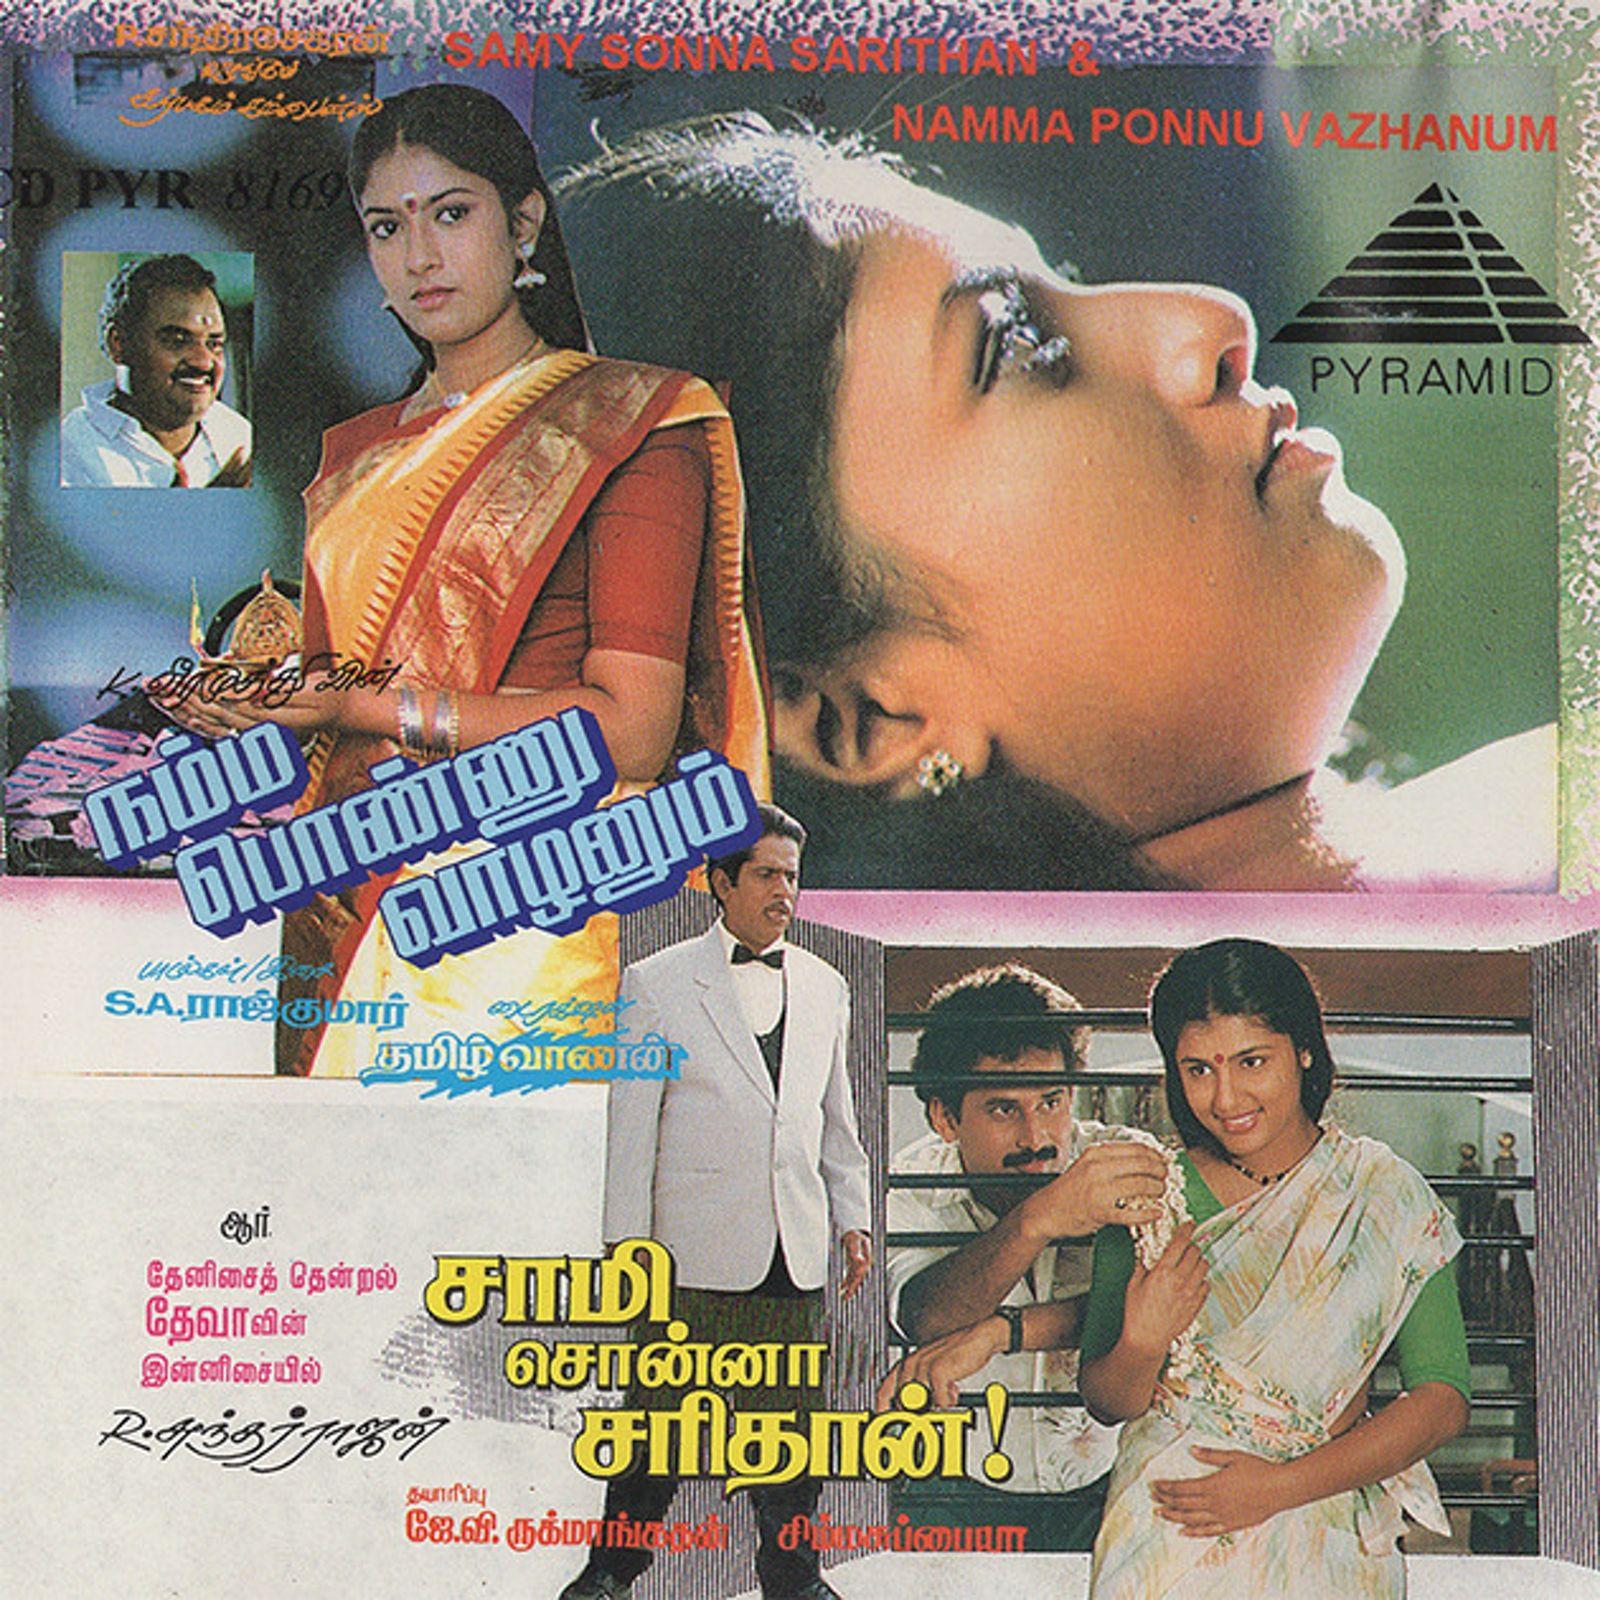 Saamy Sonna Sarithan Namma Ponnu Vazhanum In 2020 Desi Music 90s Songs 80s Songs